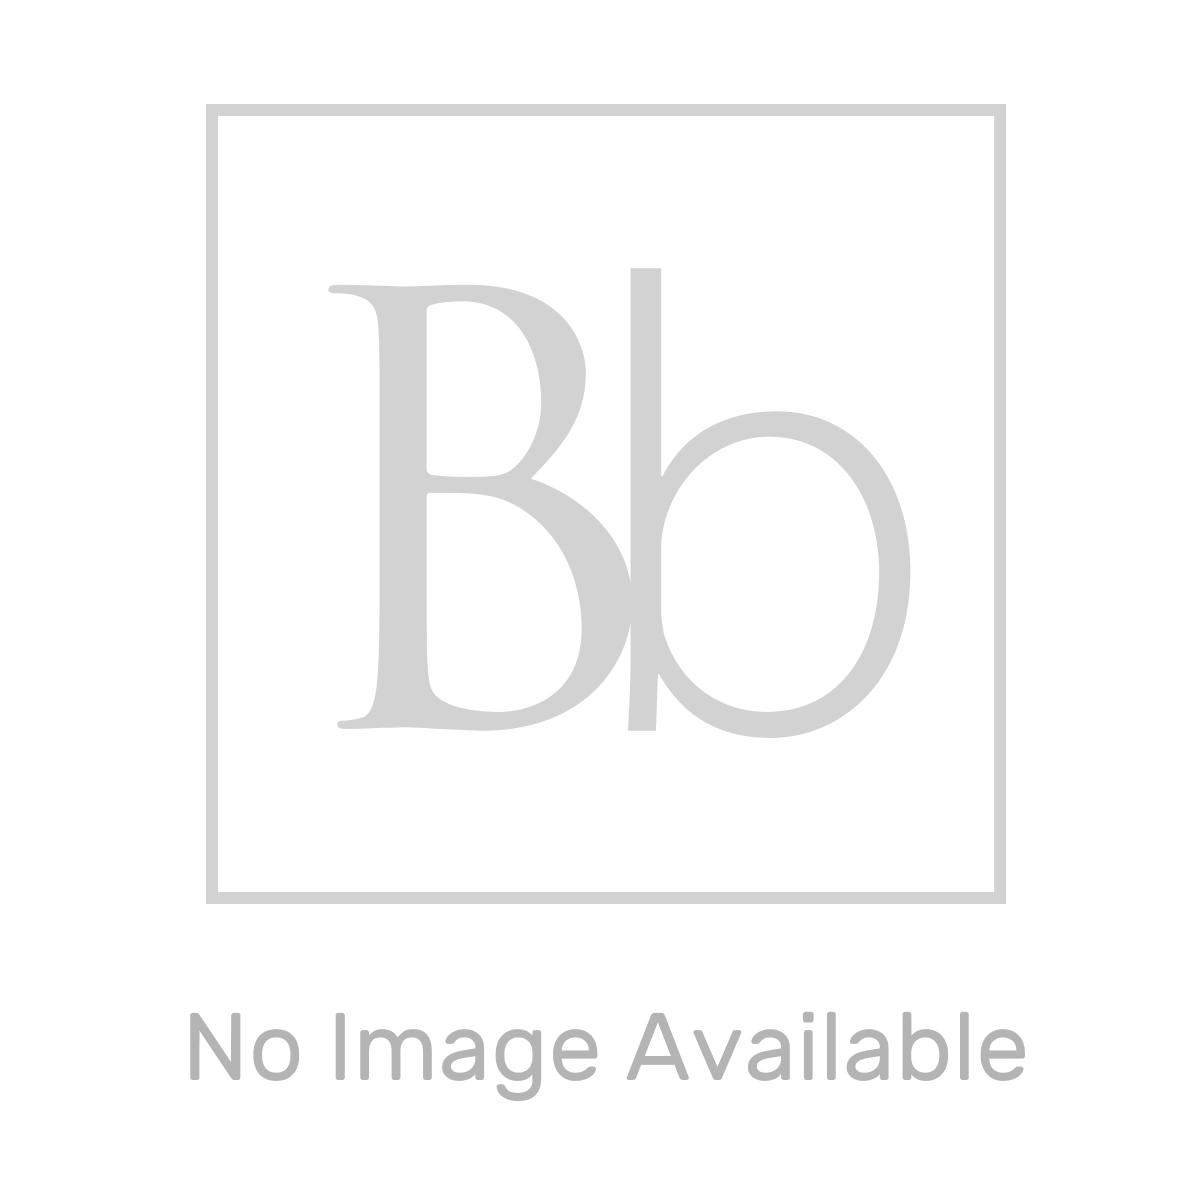 Aquadart White Slate Shower Tray 1500 x 700 Overhead